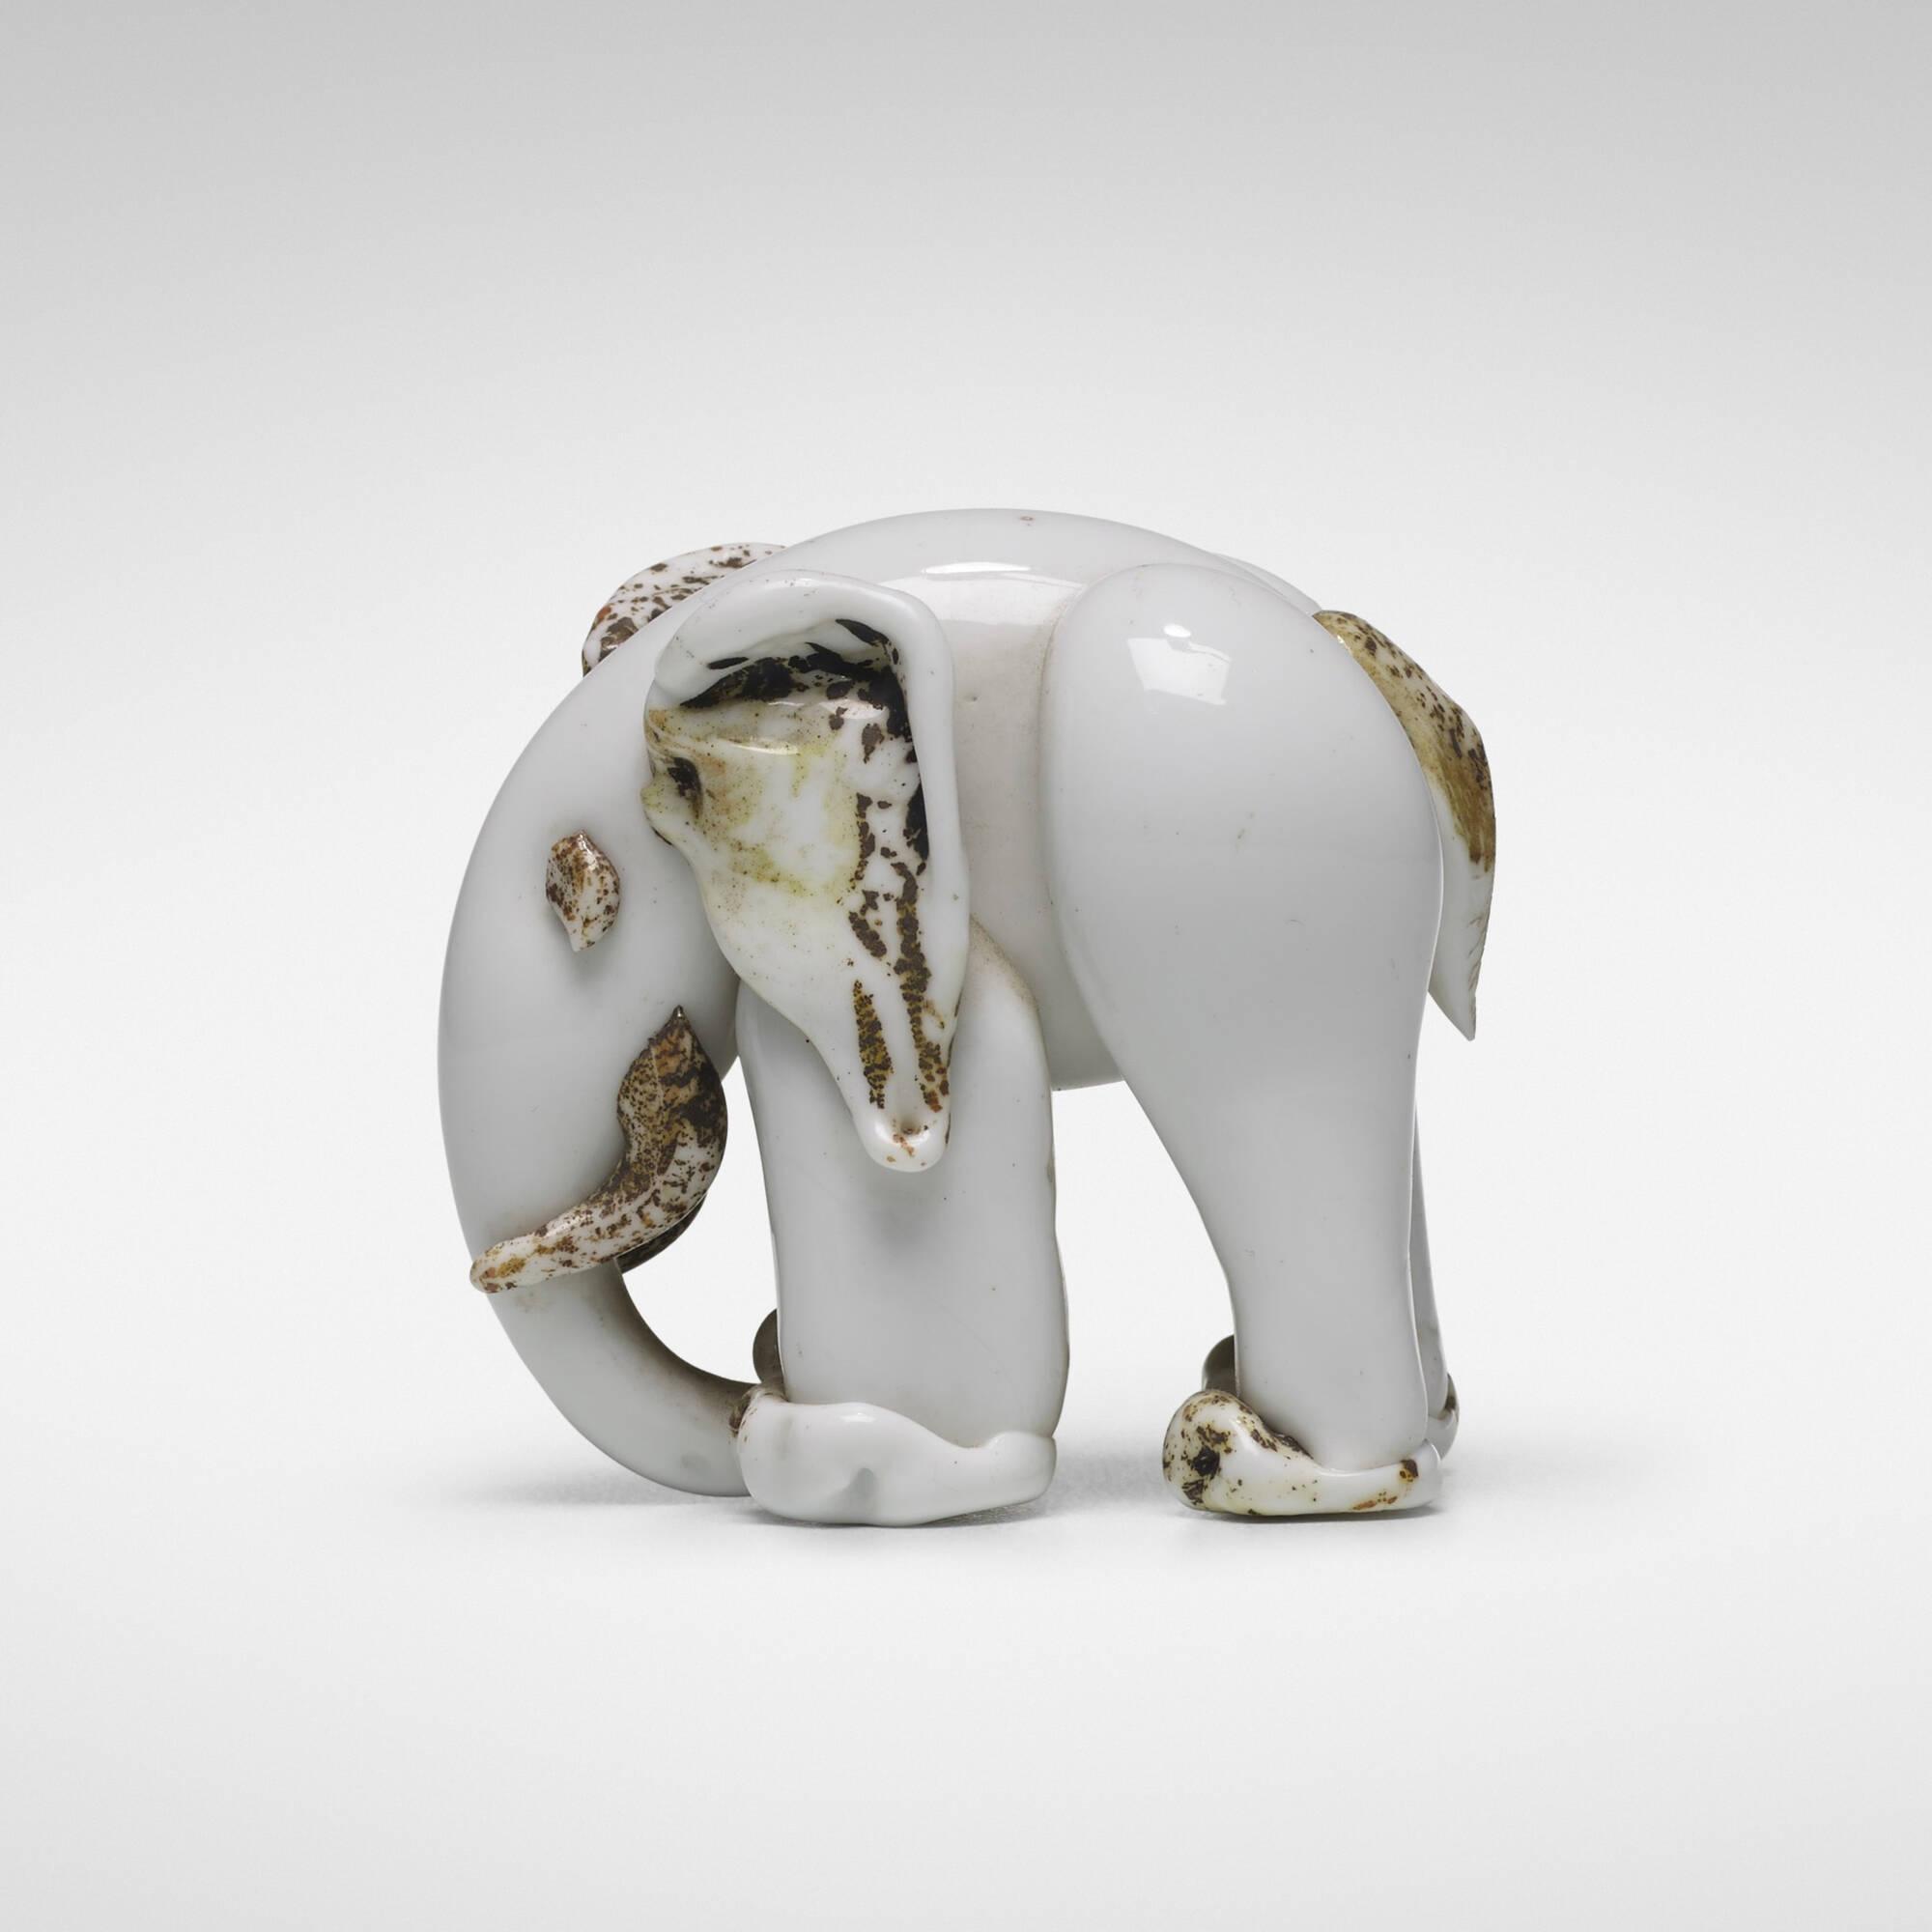 124: Ercole Barovier / Elefante (2 of 2)